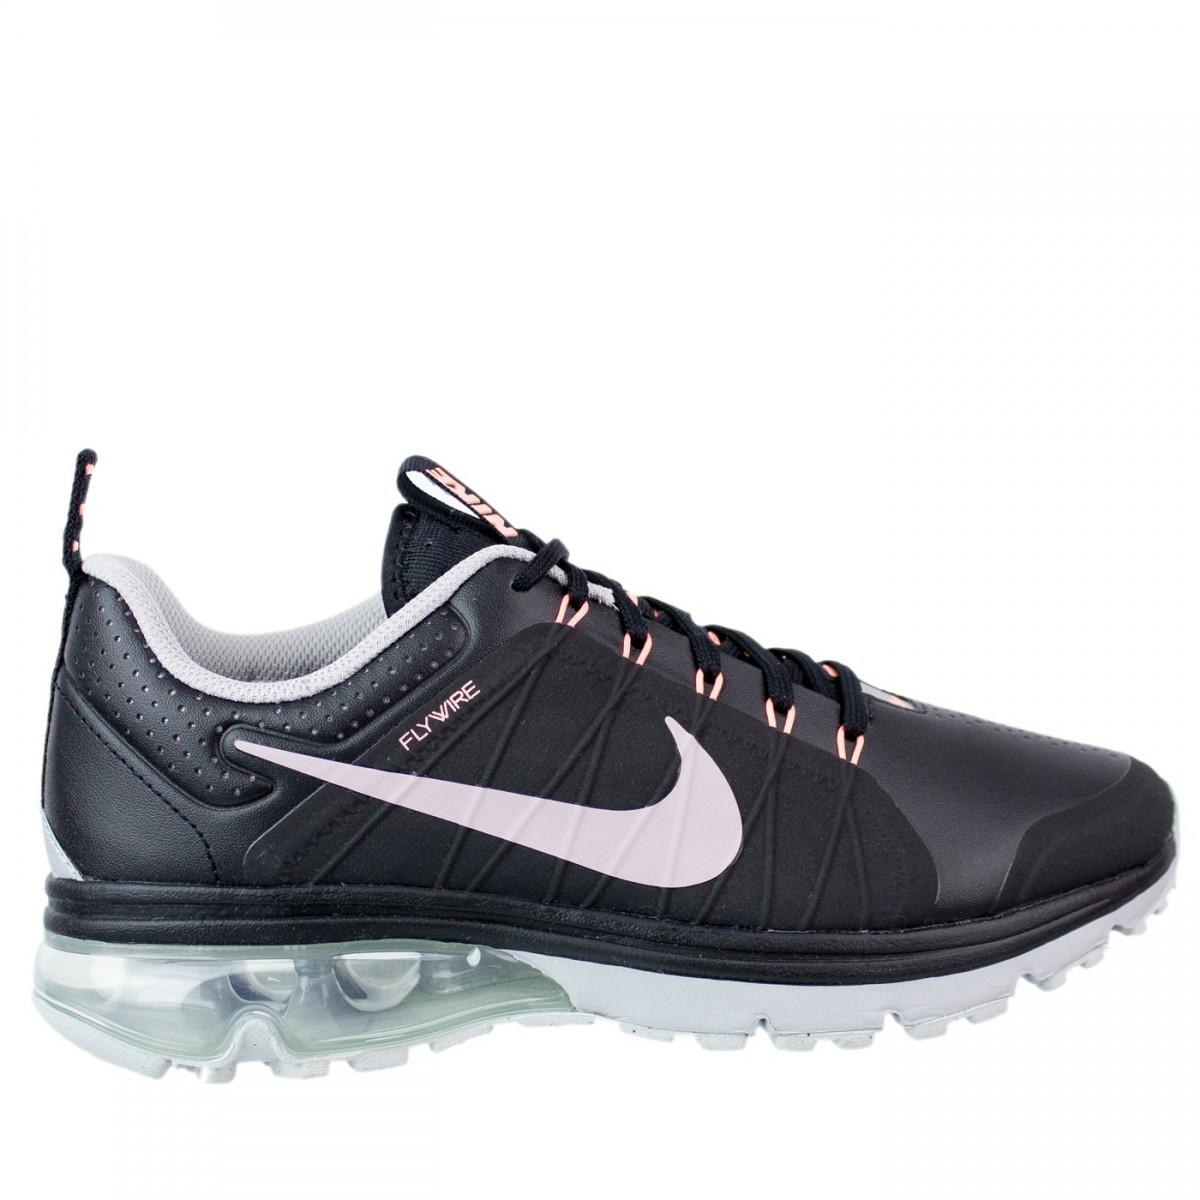 841a36f8b4 Bizz Store - Tênis Feminino Nike Air Max Supreme 4 Corrida